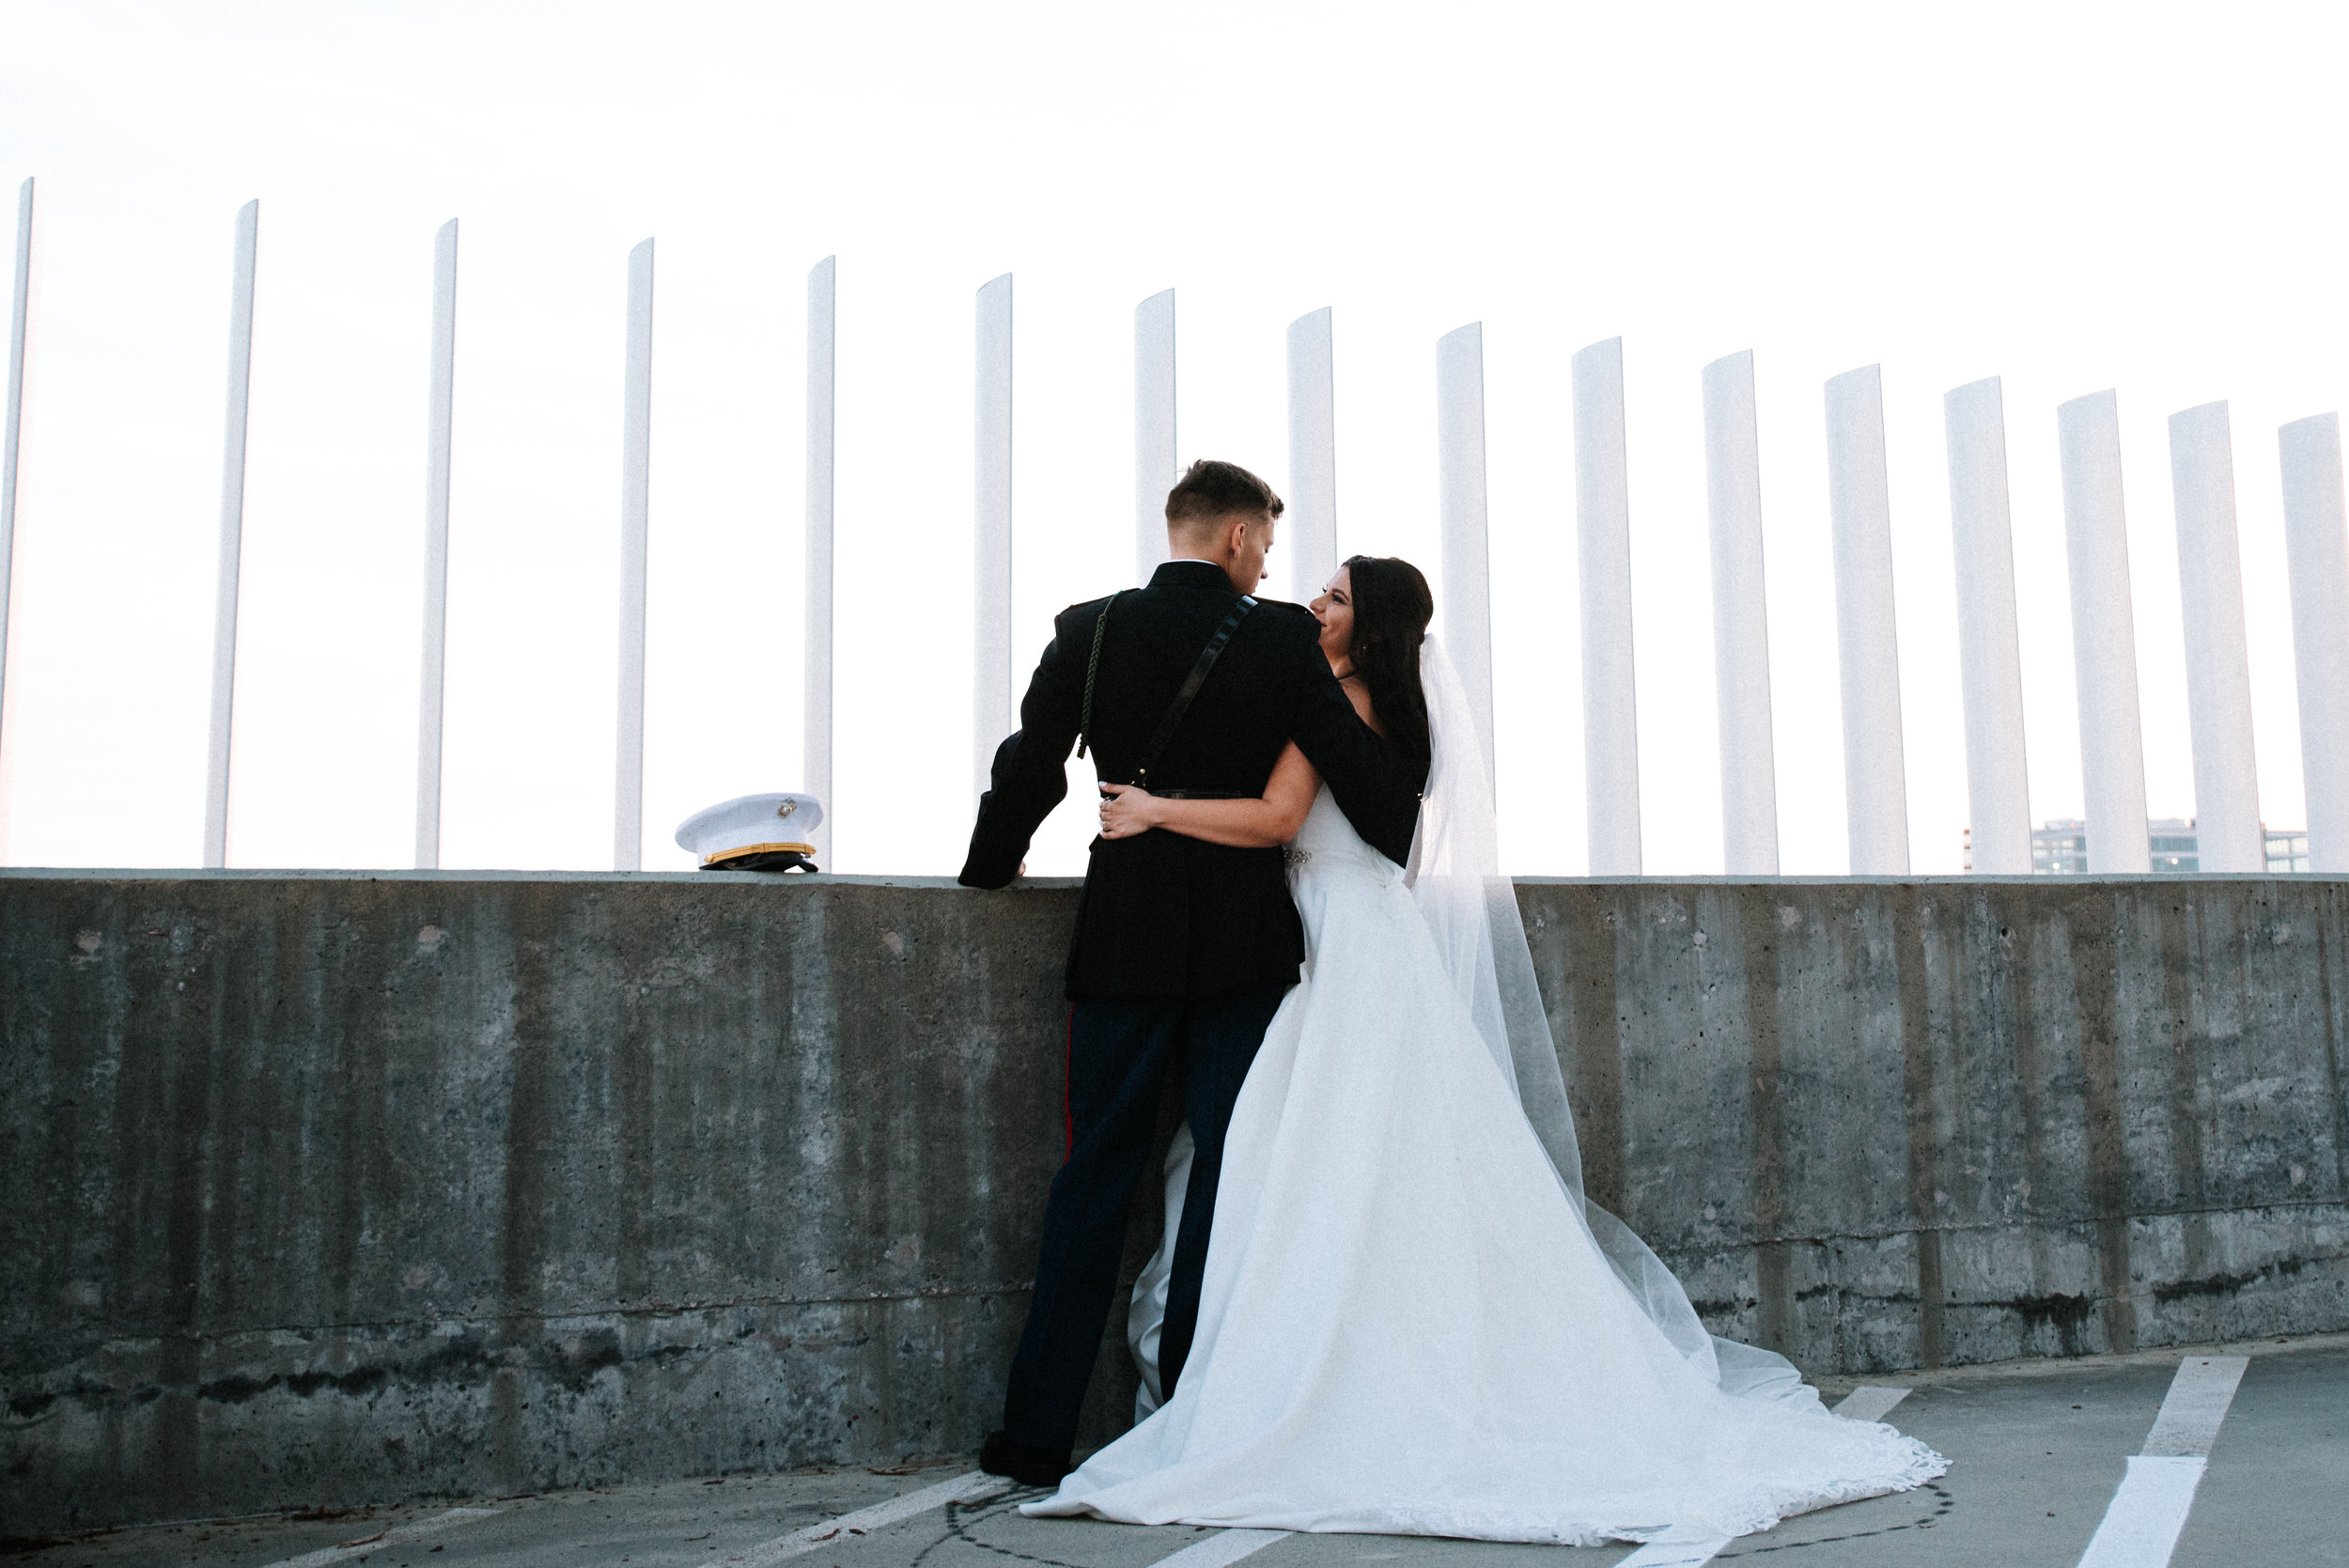 +Raleigh Wedding +North Carolina +Photographer +Wedding Photographer +Engagement Photographer +All Saints Chapel-6964.jpg